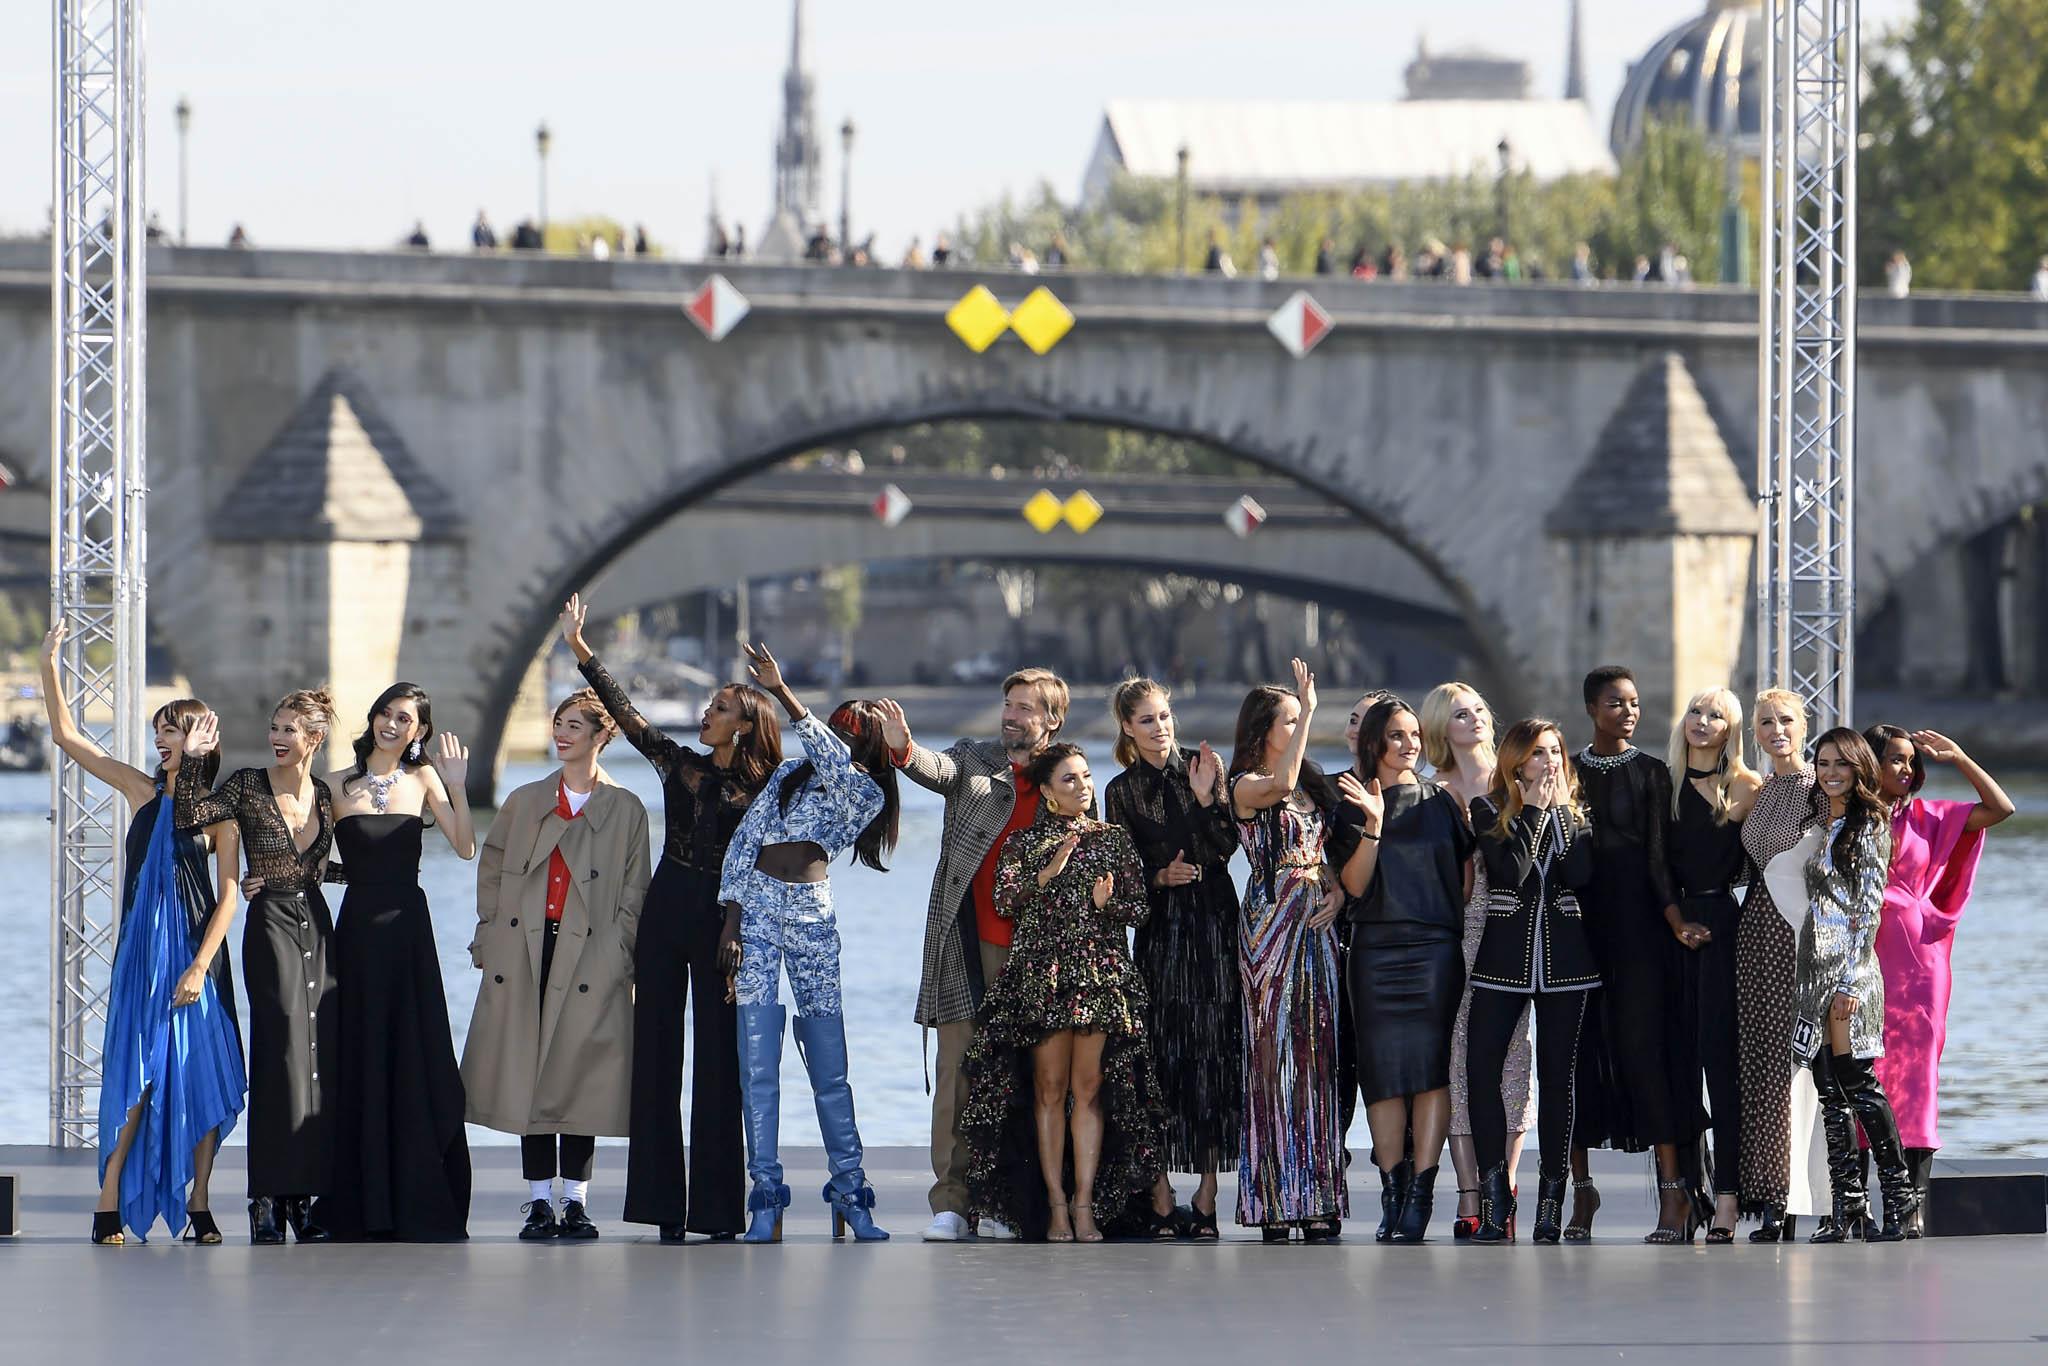 Liya Kebede, Eva Longoria, Doutzen Kroes, Cheryl, Andie MacDowell, Elle Fanning, Maria Borges and models on the catwalk